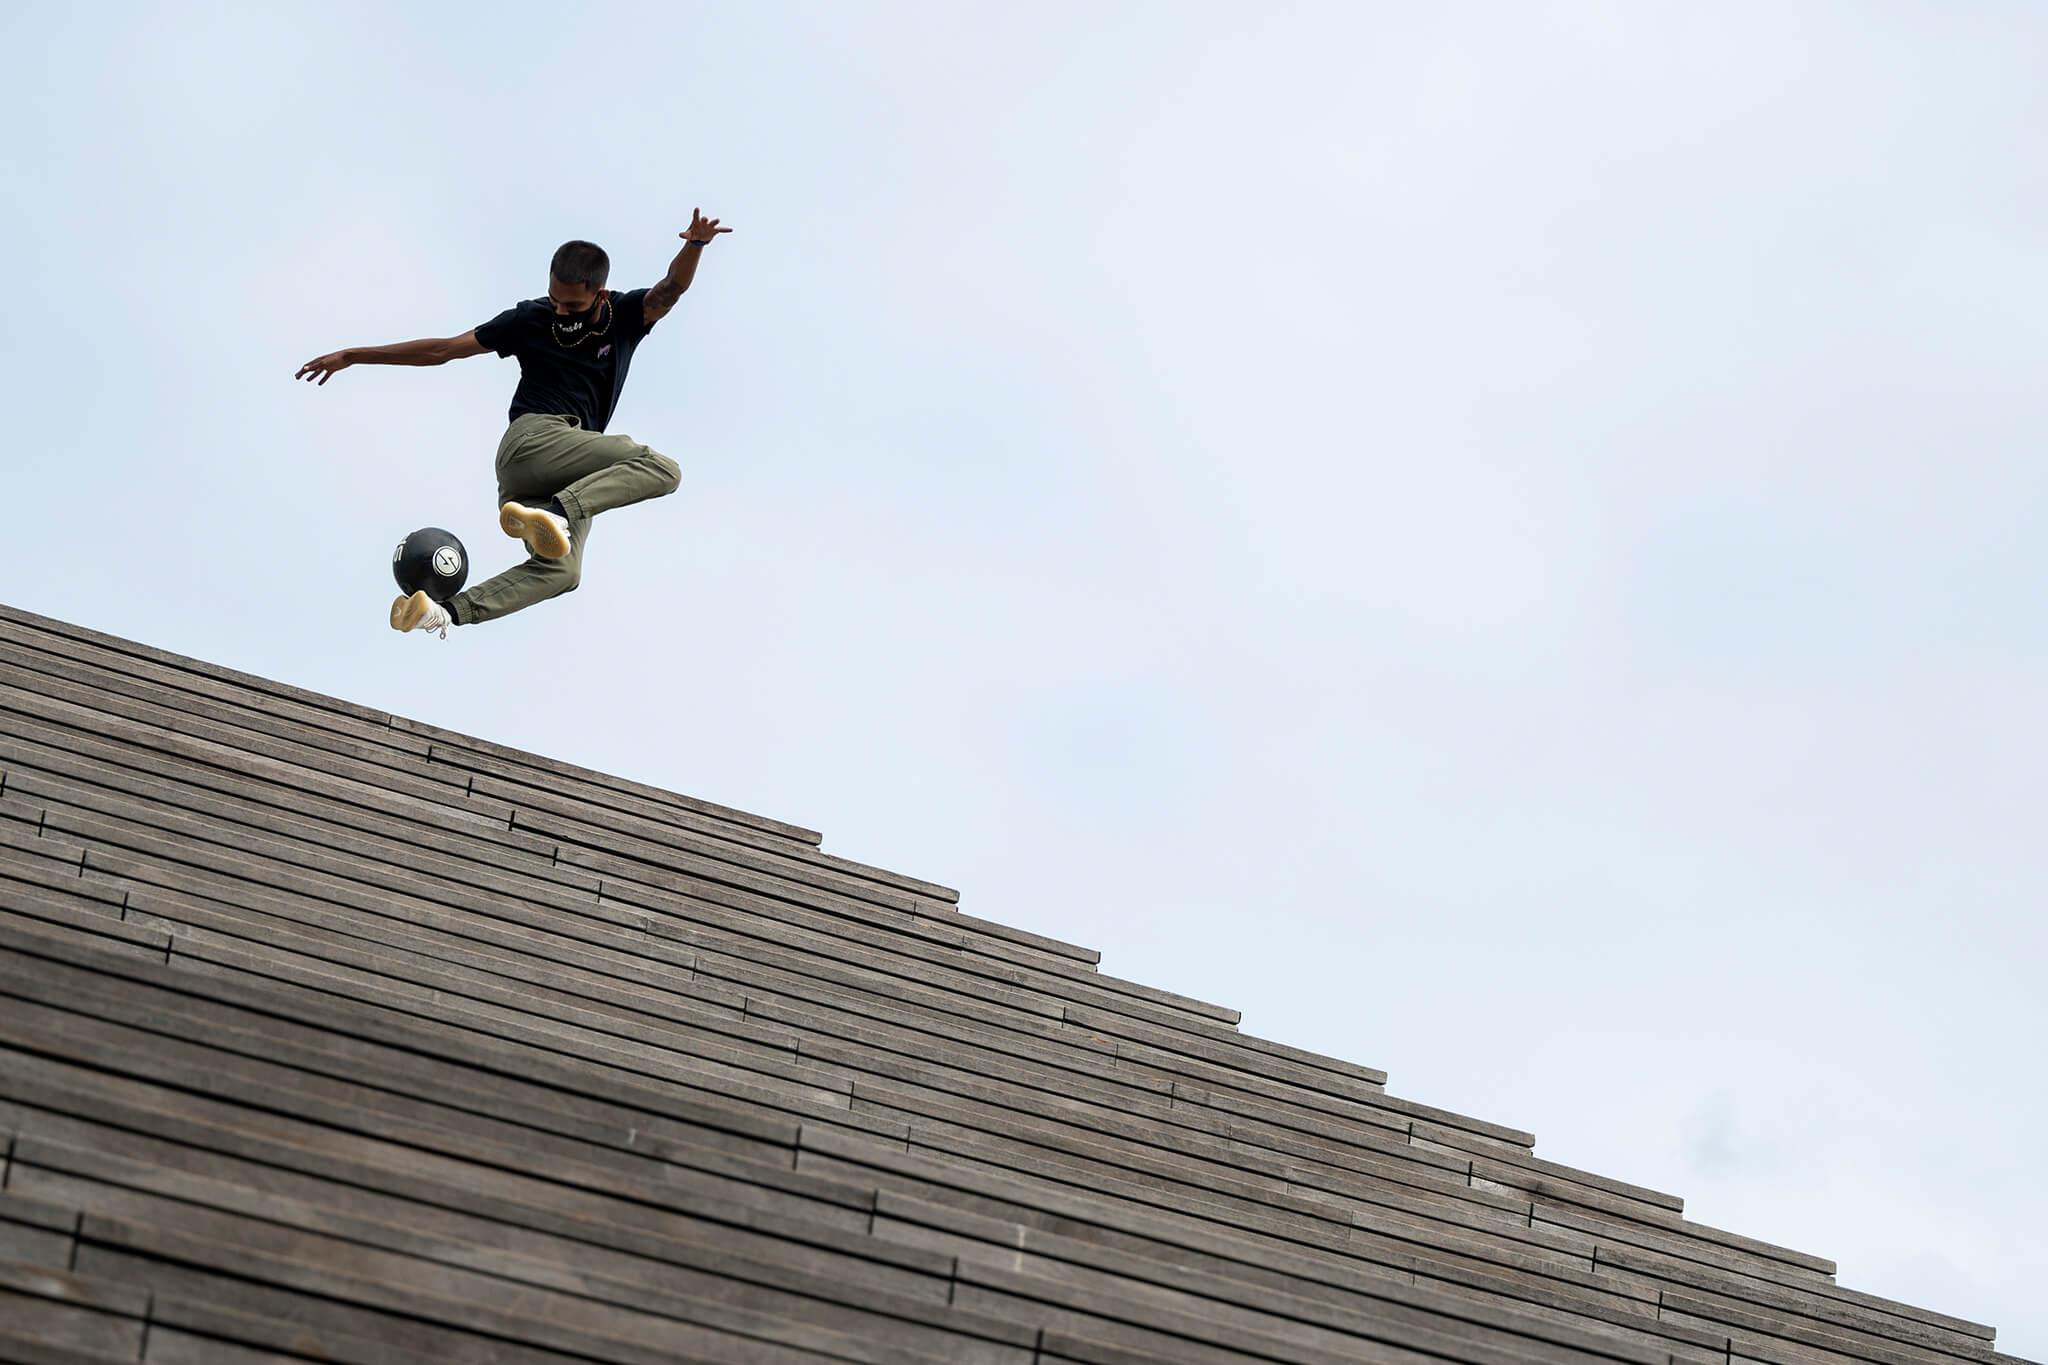 Freestyle fotbalista | Foto Little Shao Photographer |Nikon Z 50+ Nikkor Z 70–200 mm f/2,8 VR S | ISO 100, 1/1 250 s, F2,8